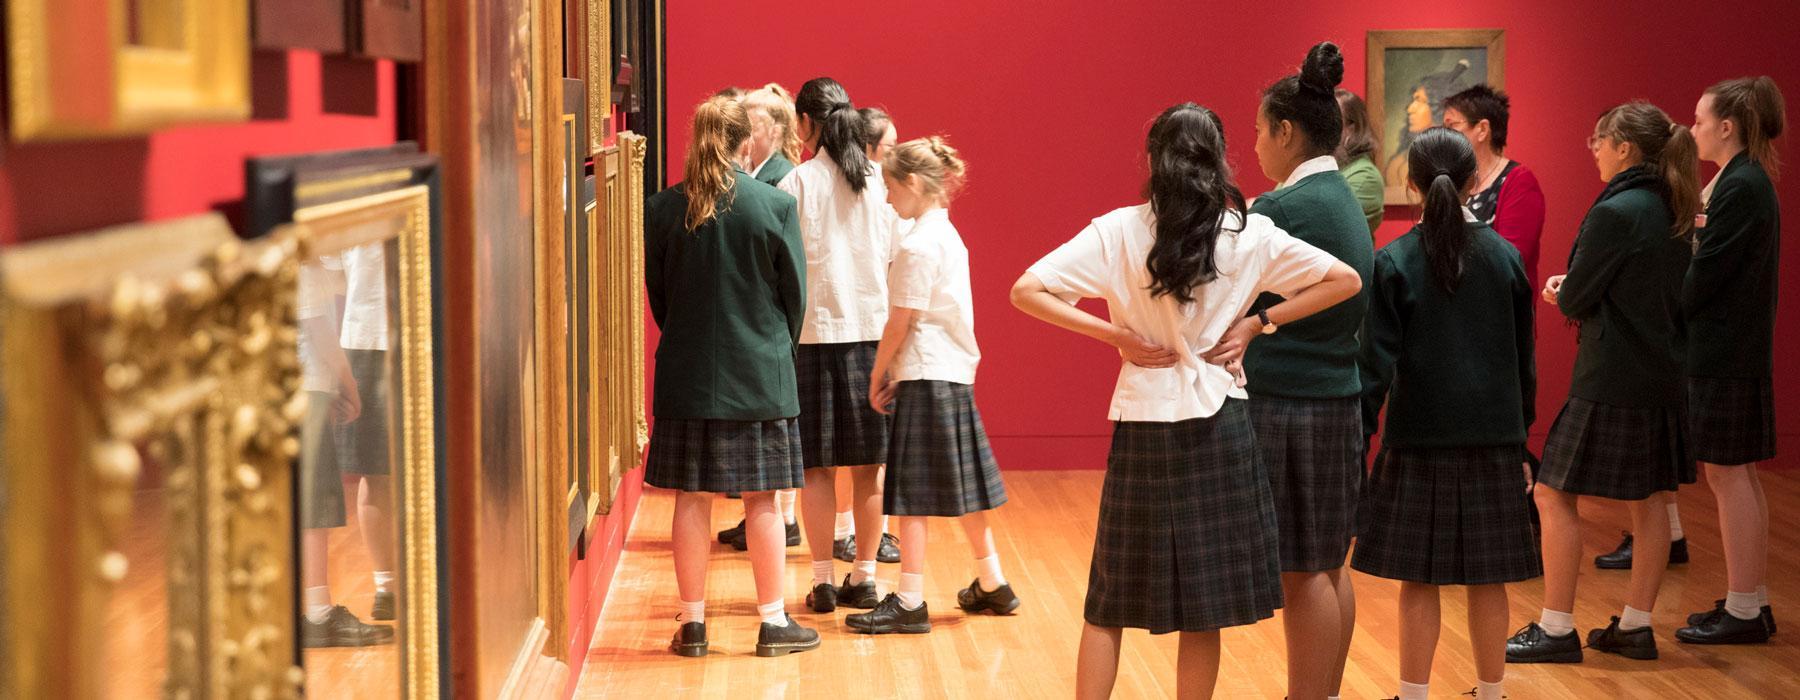 School girls look at historical art